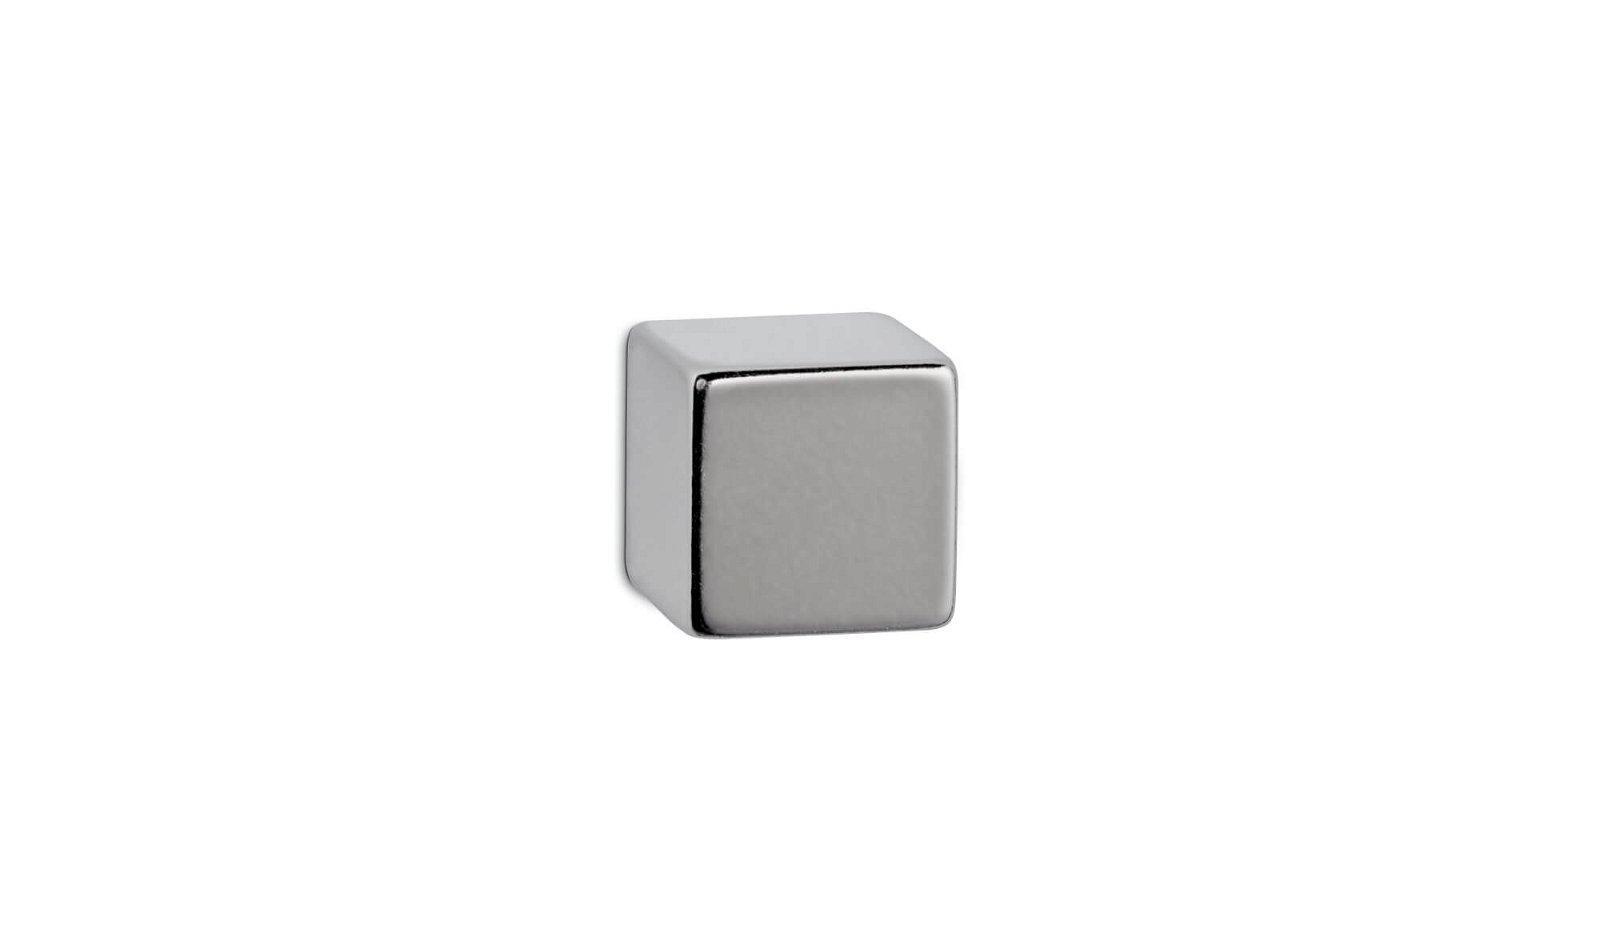 Neodym-Würfelmagnet, 15x15x15 mm, 15 kg Haftkraft, hellsilber